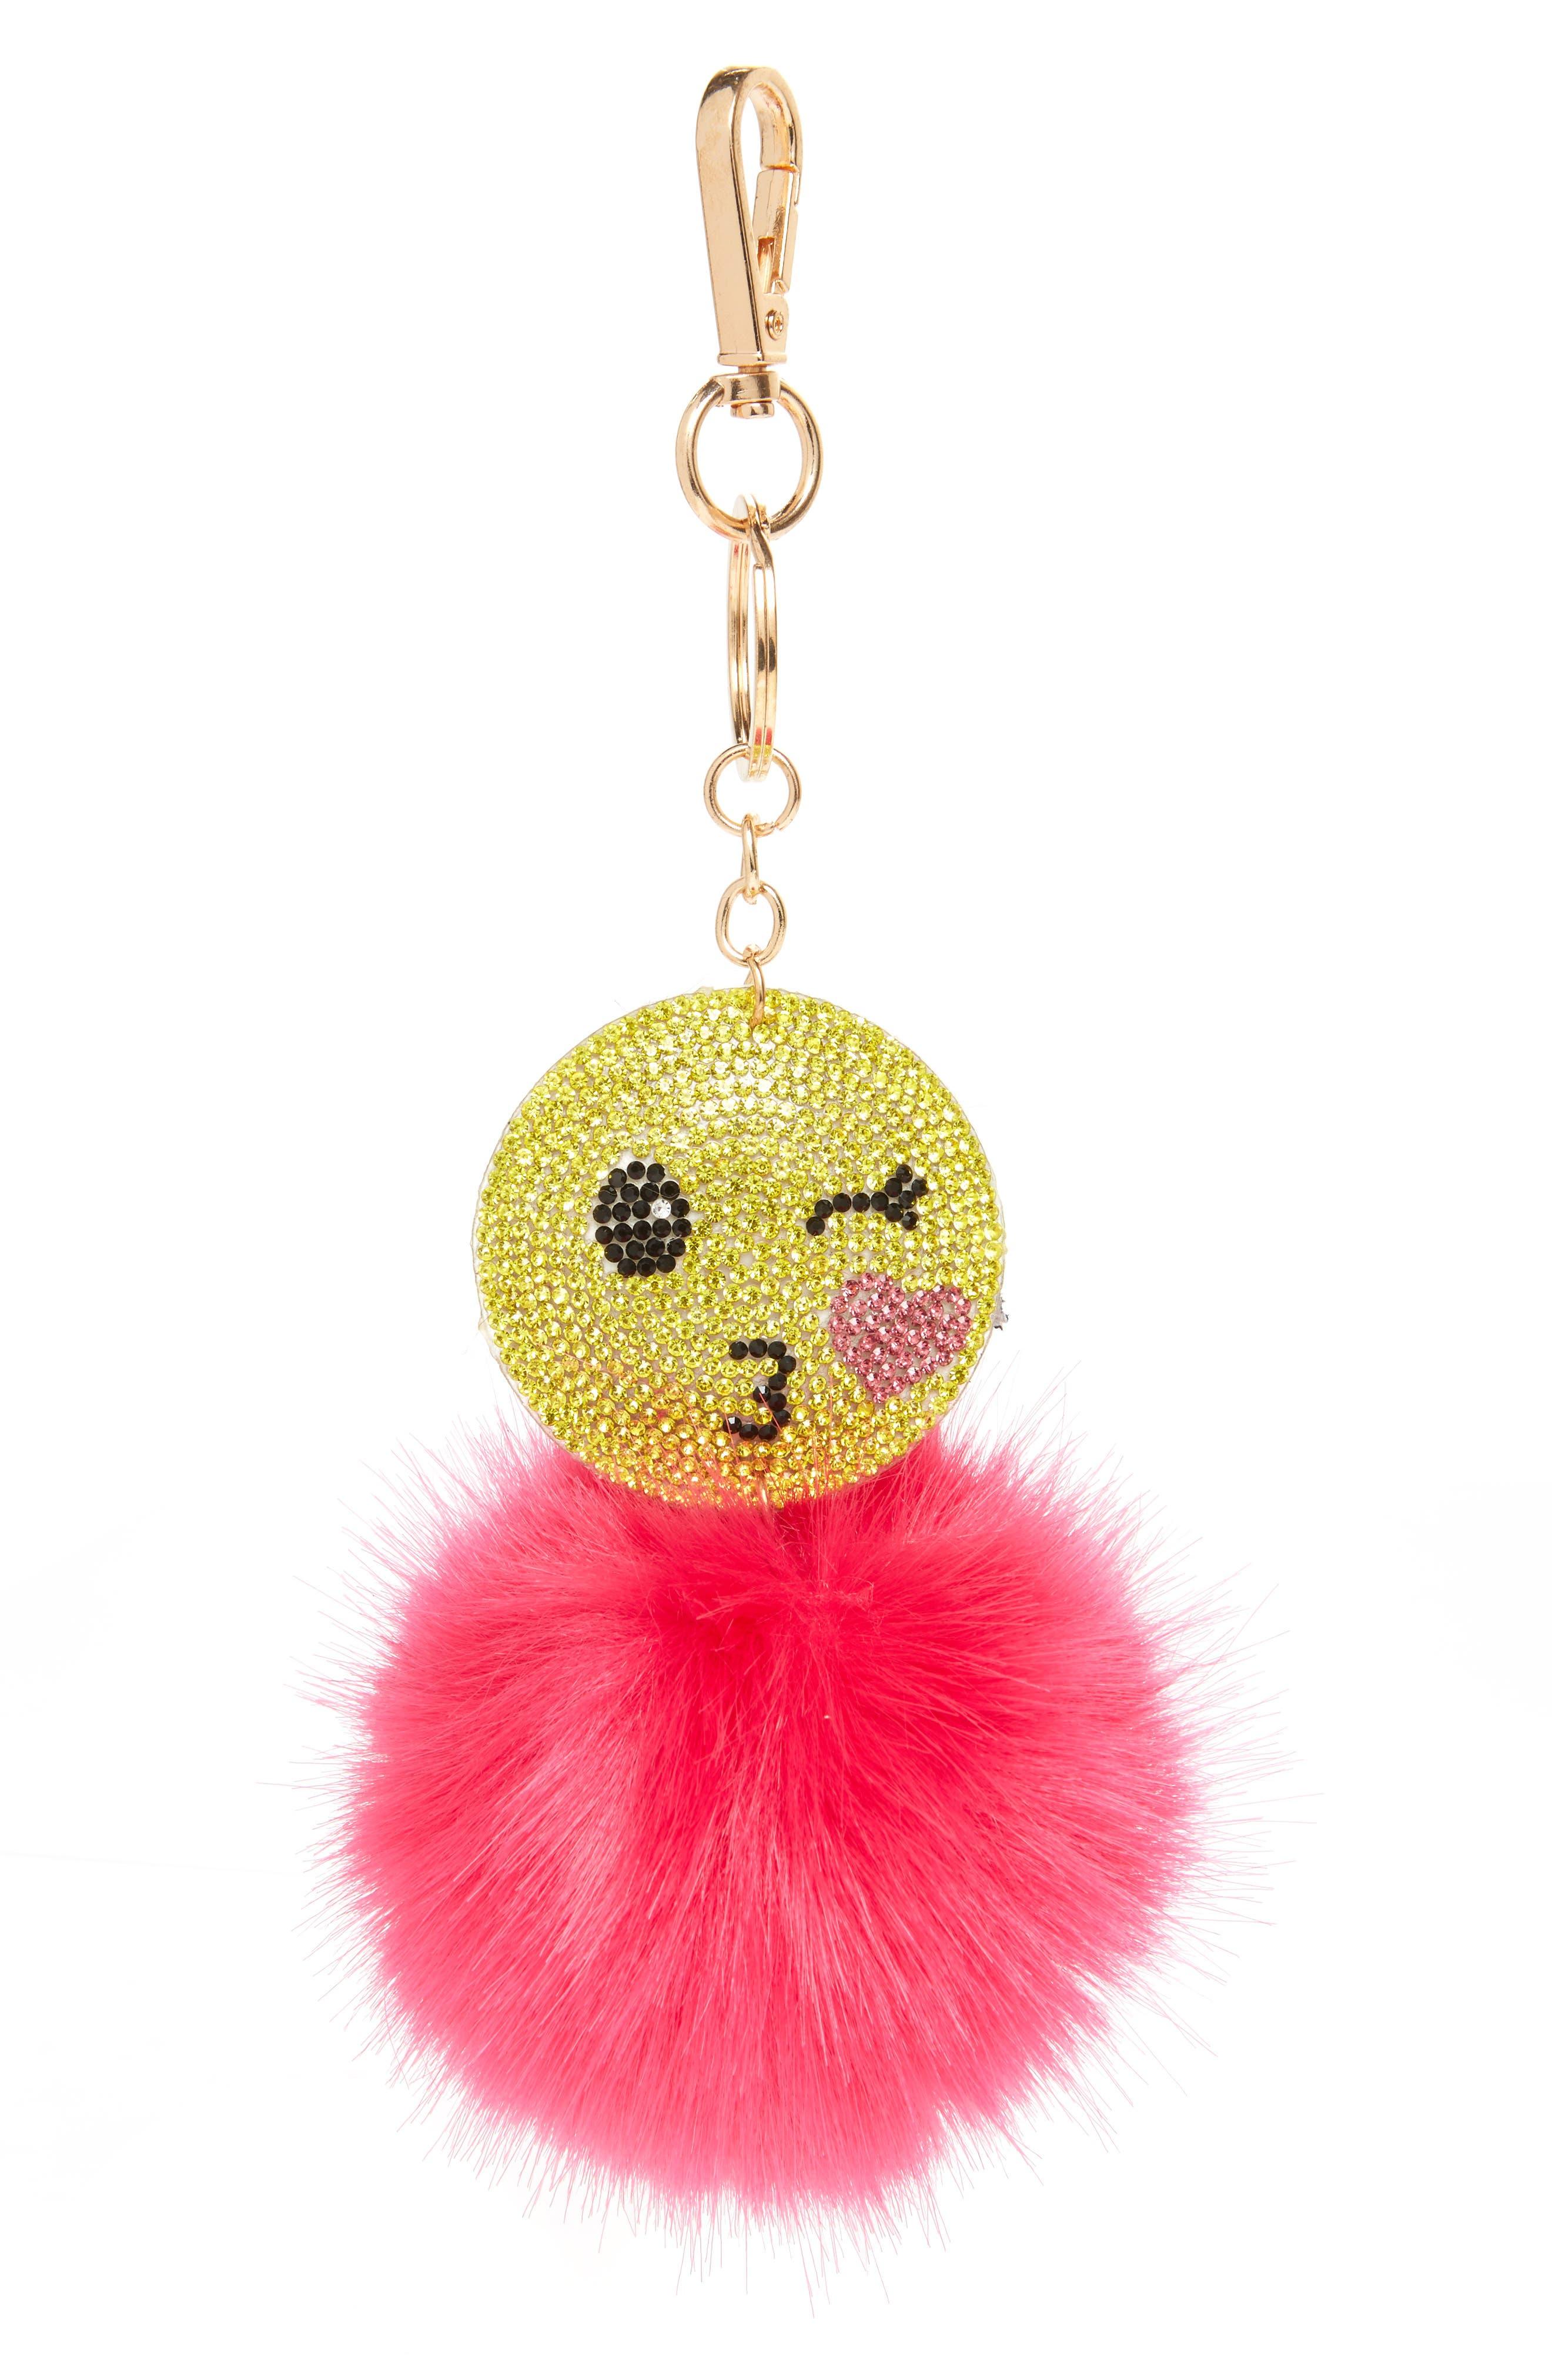 Wink Emoji Pom Faux Fur Bag Charm,                             Main thumbnail 1, color,